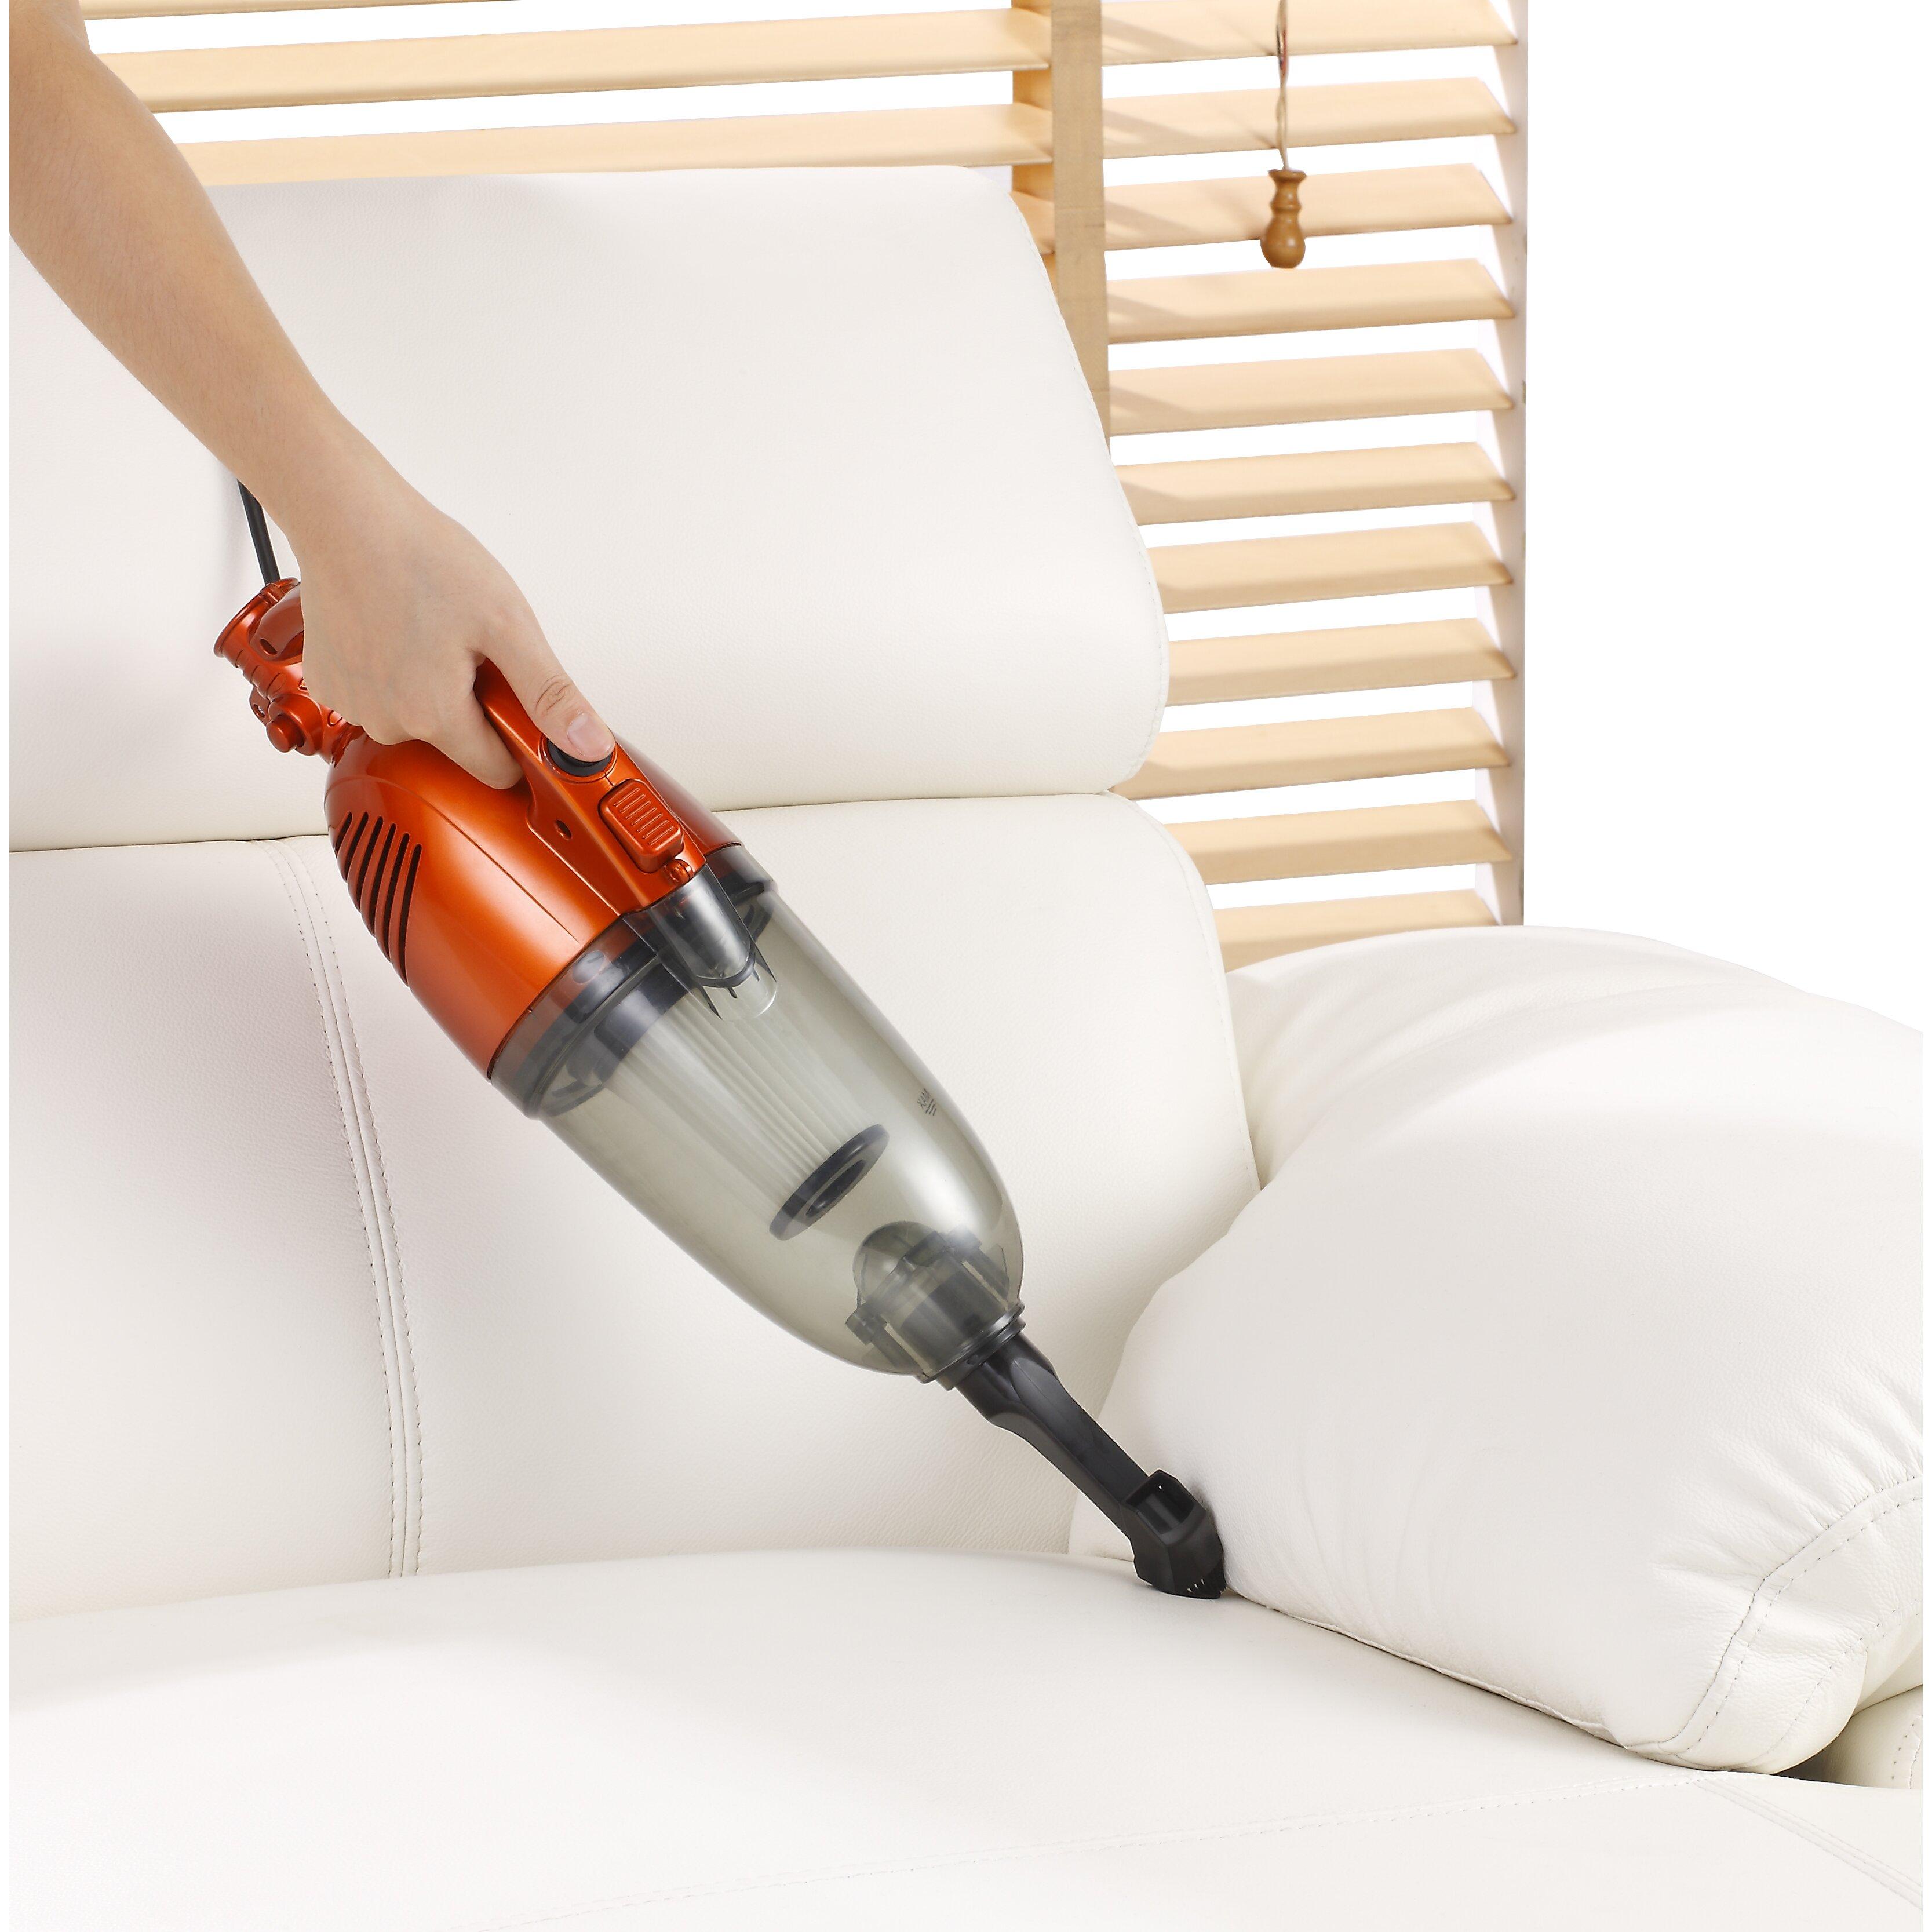 Vonhaus Upright Stick And Handheld Vacuum Cleaner Wayfair